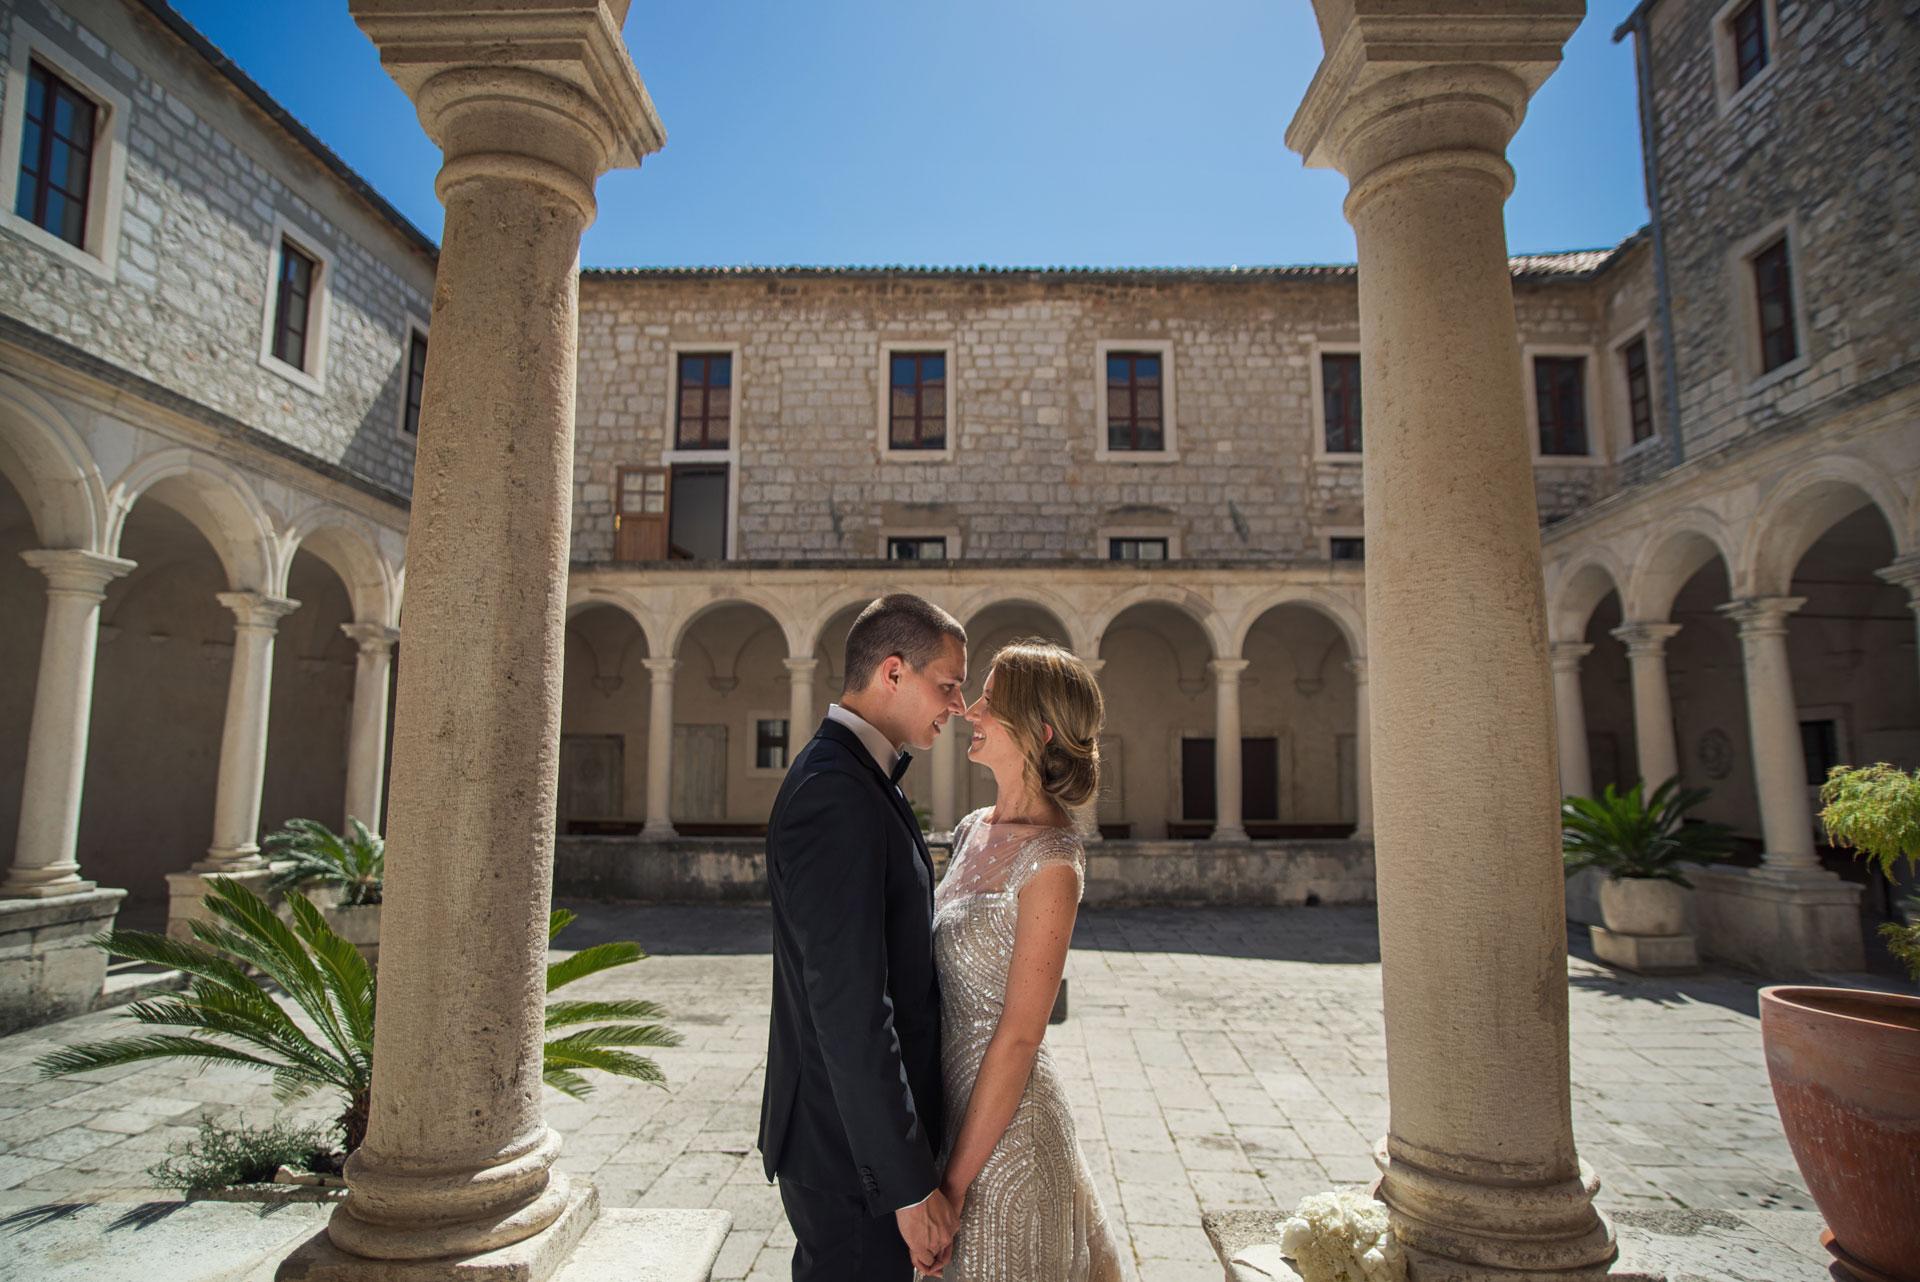 Wedding photographer Dubrovnik bride groom old palace